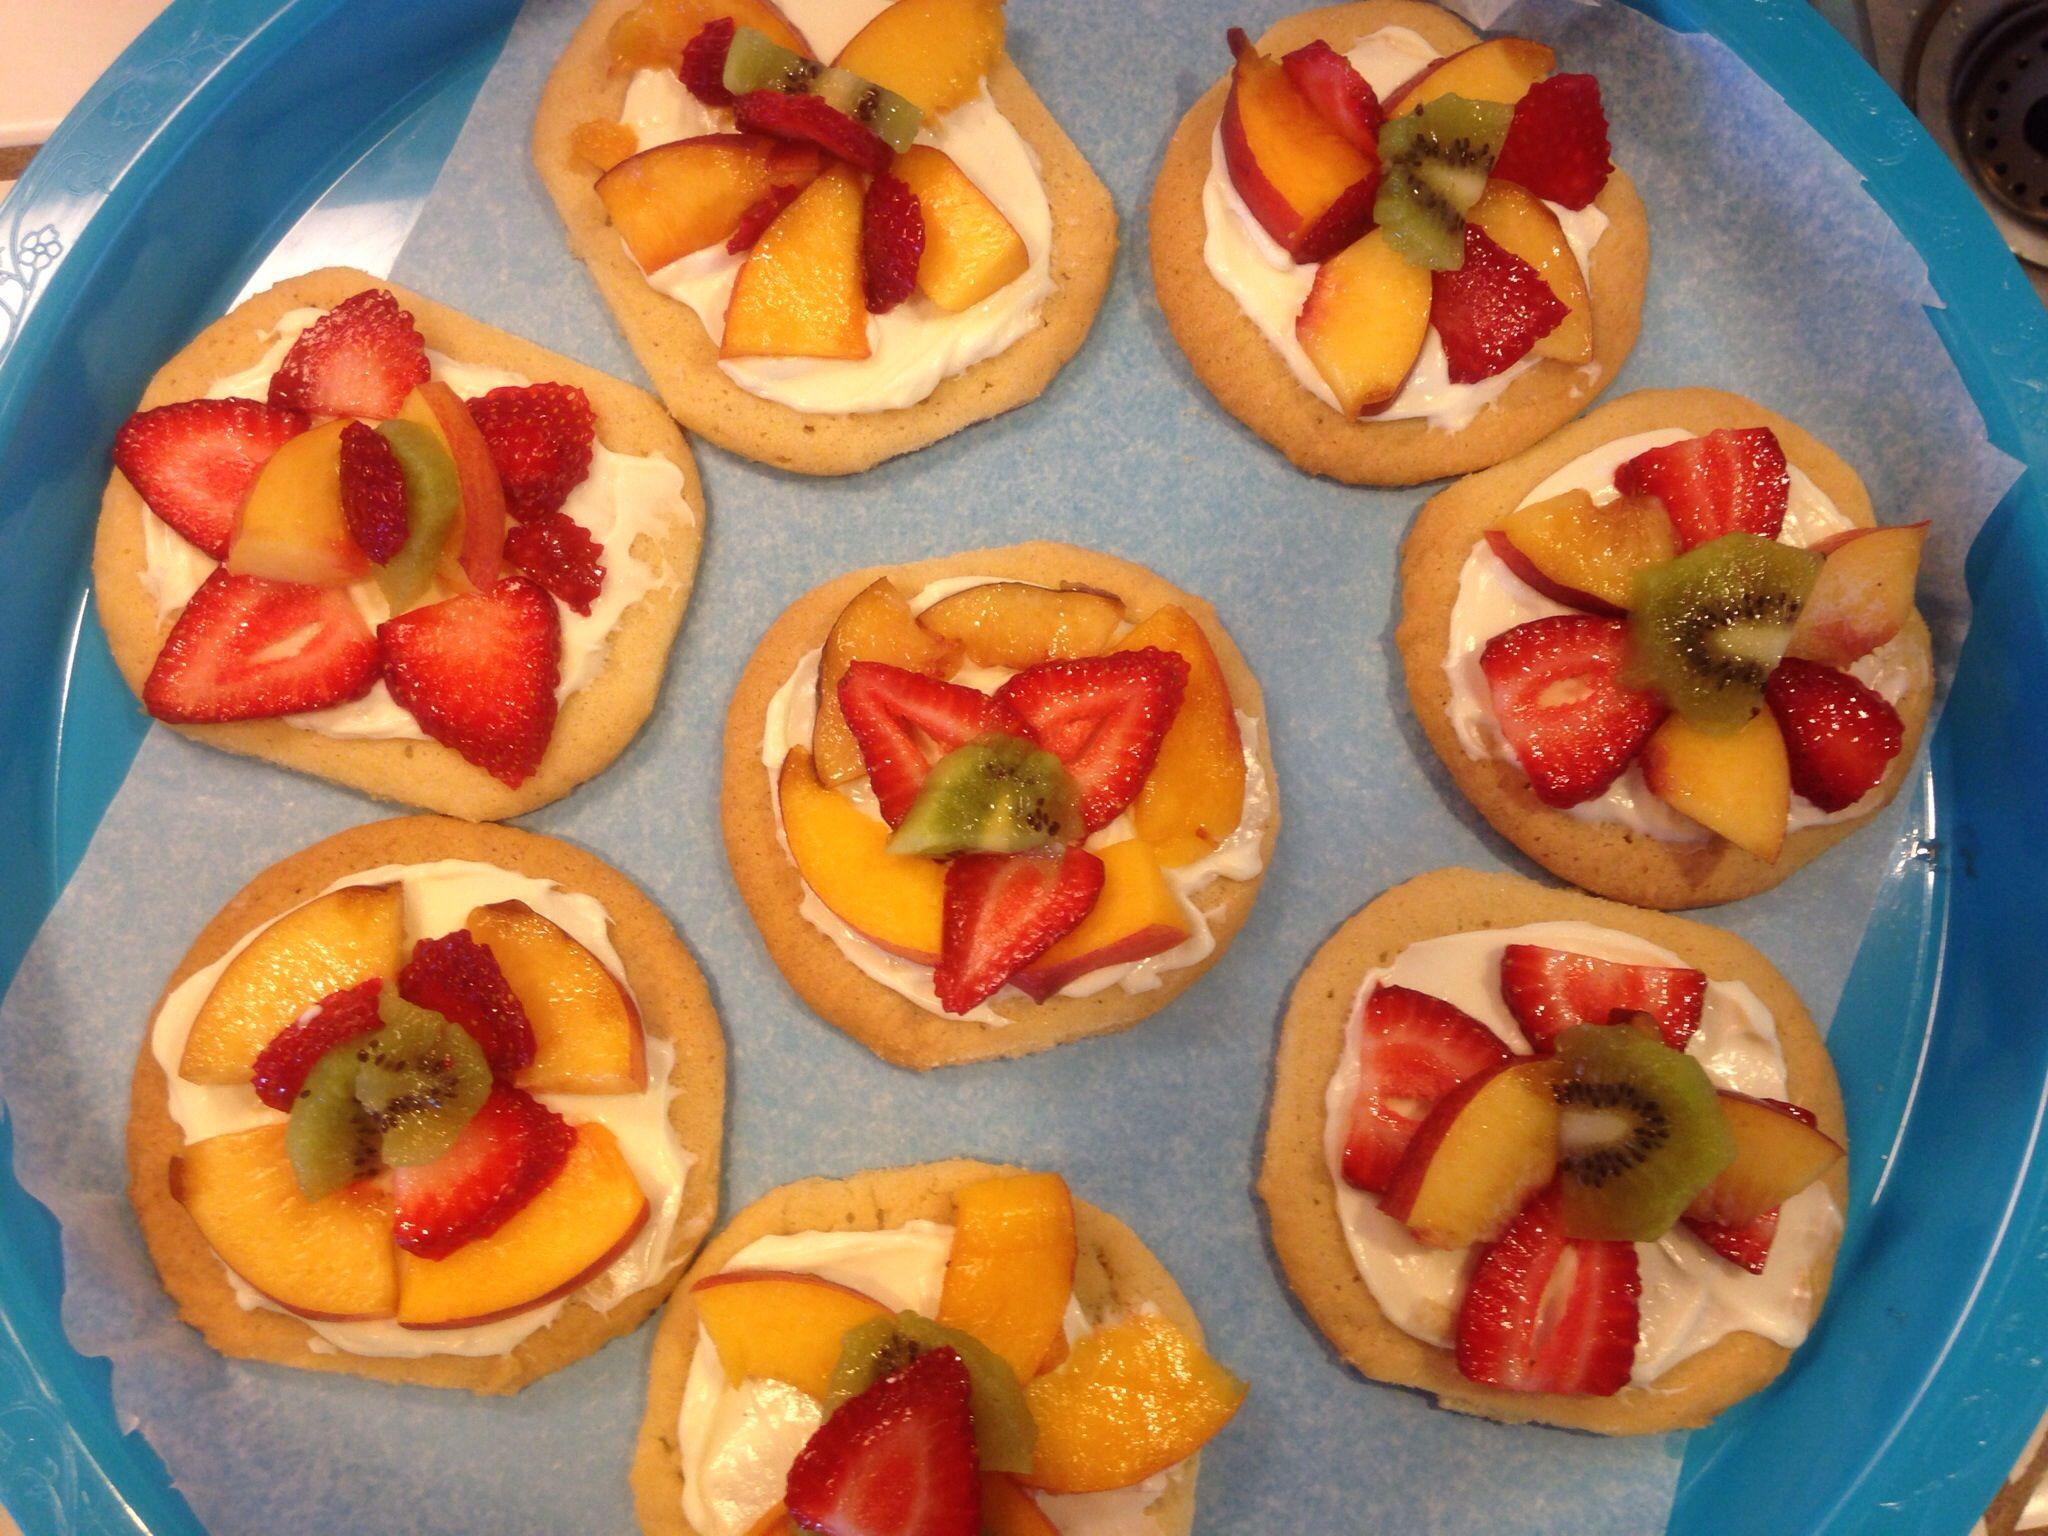 Mini Fruit Pizza | I DID IT! | Pinterest